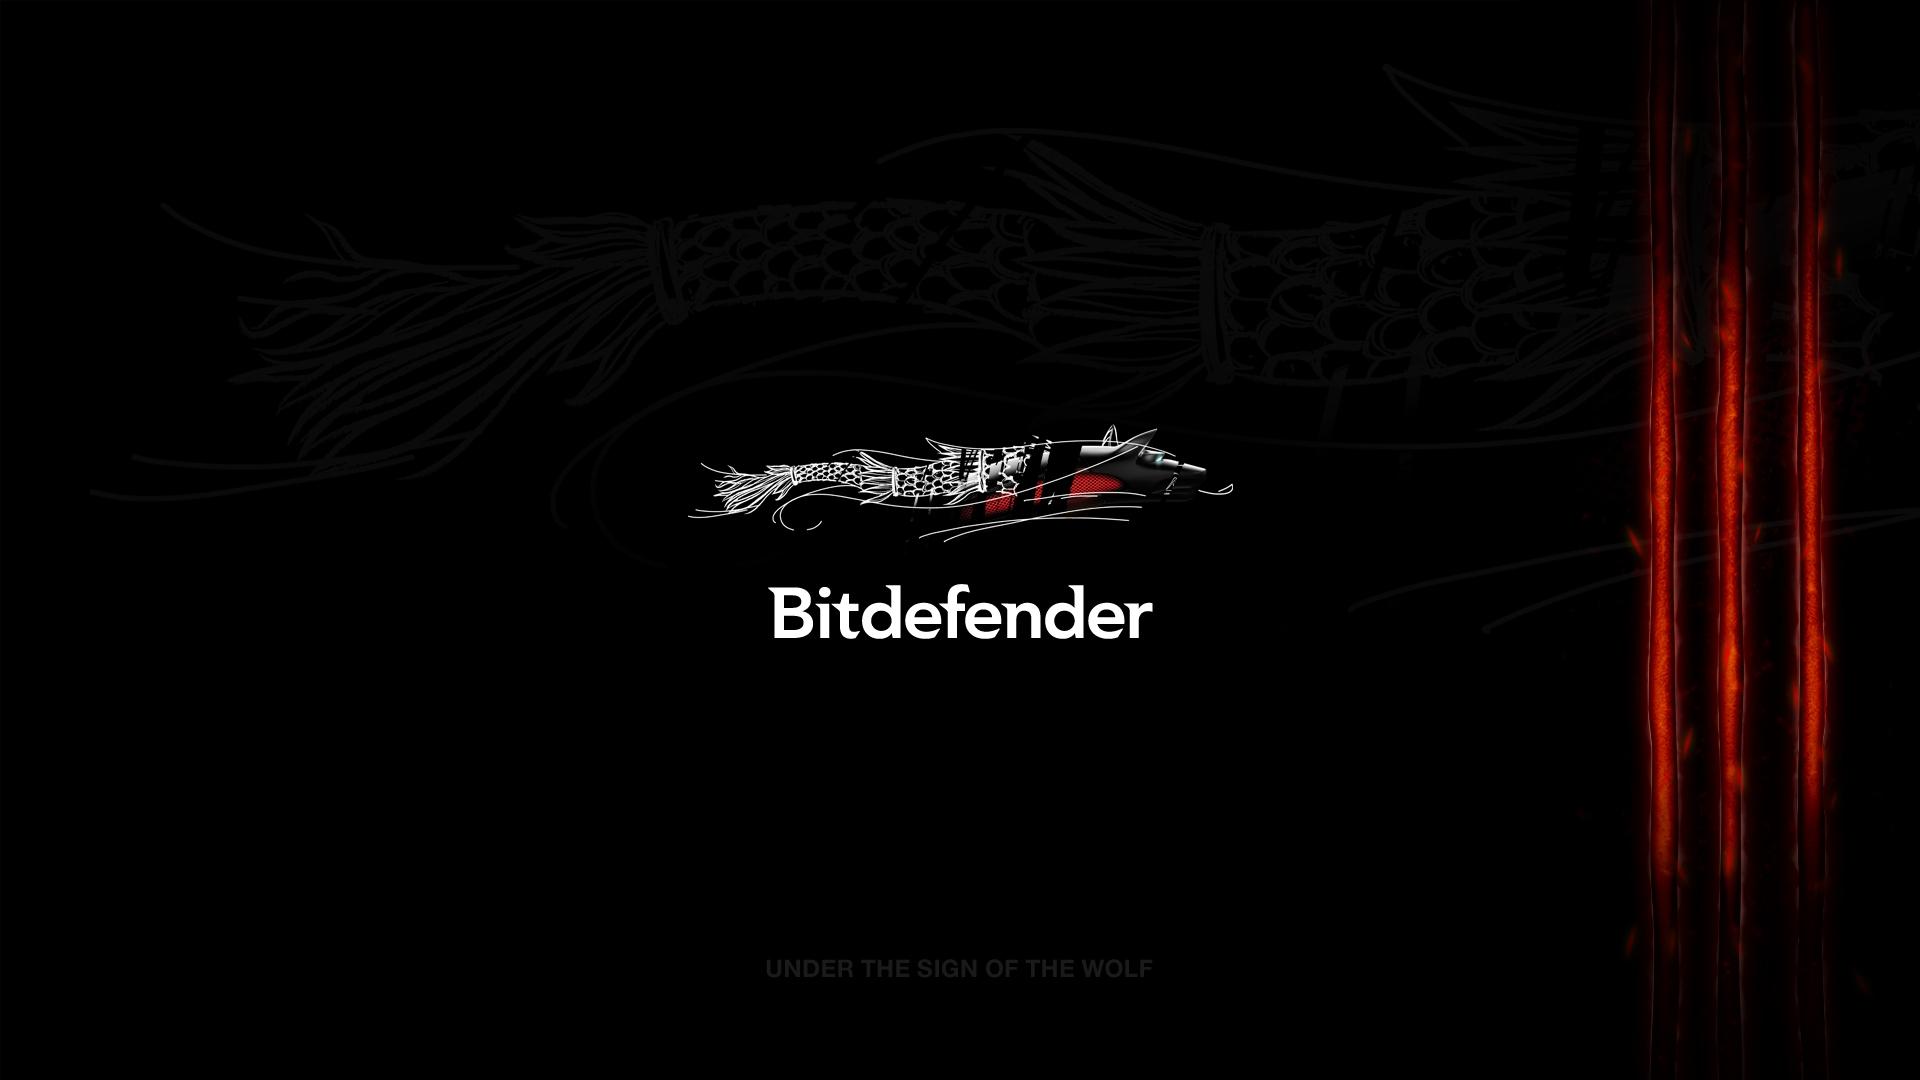 download Bitdefender Wallpapers Logos Download HD Images 1920x1080